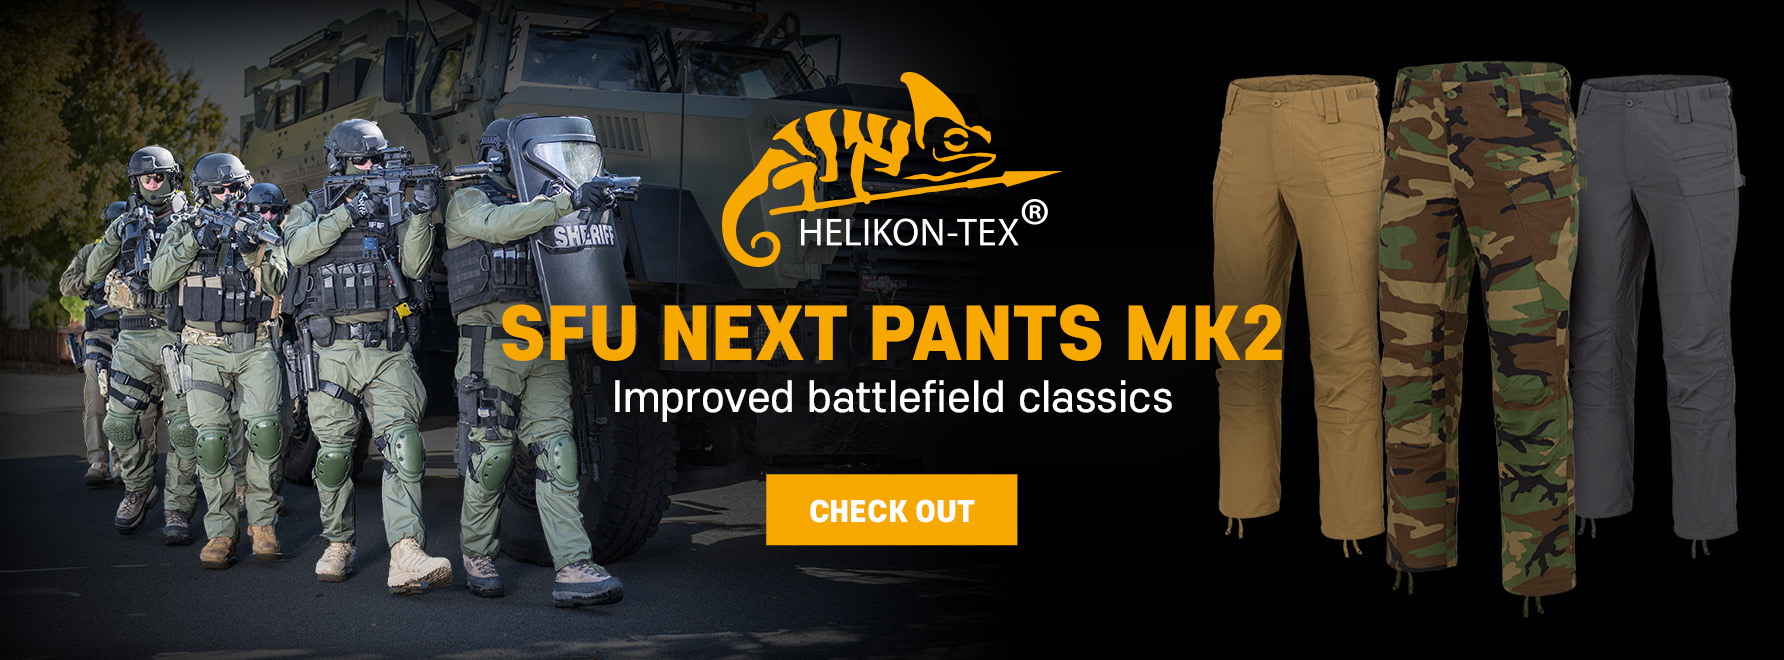 Kalhoty HELIKON SFU Next Mk2